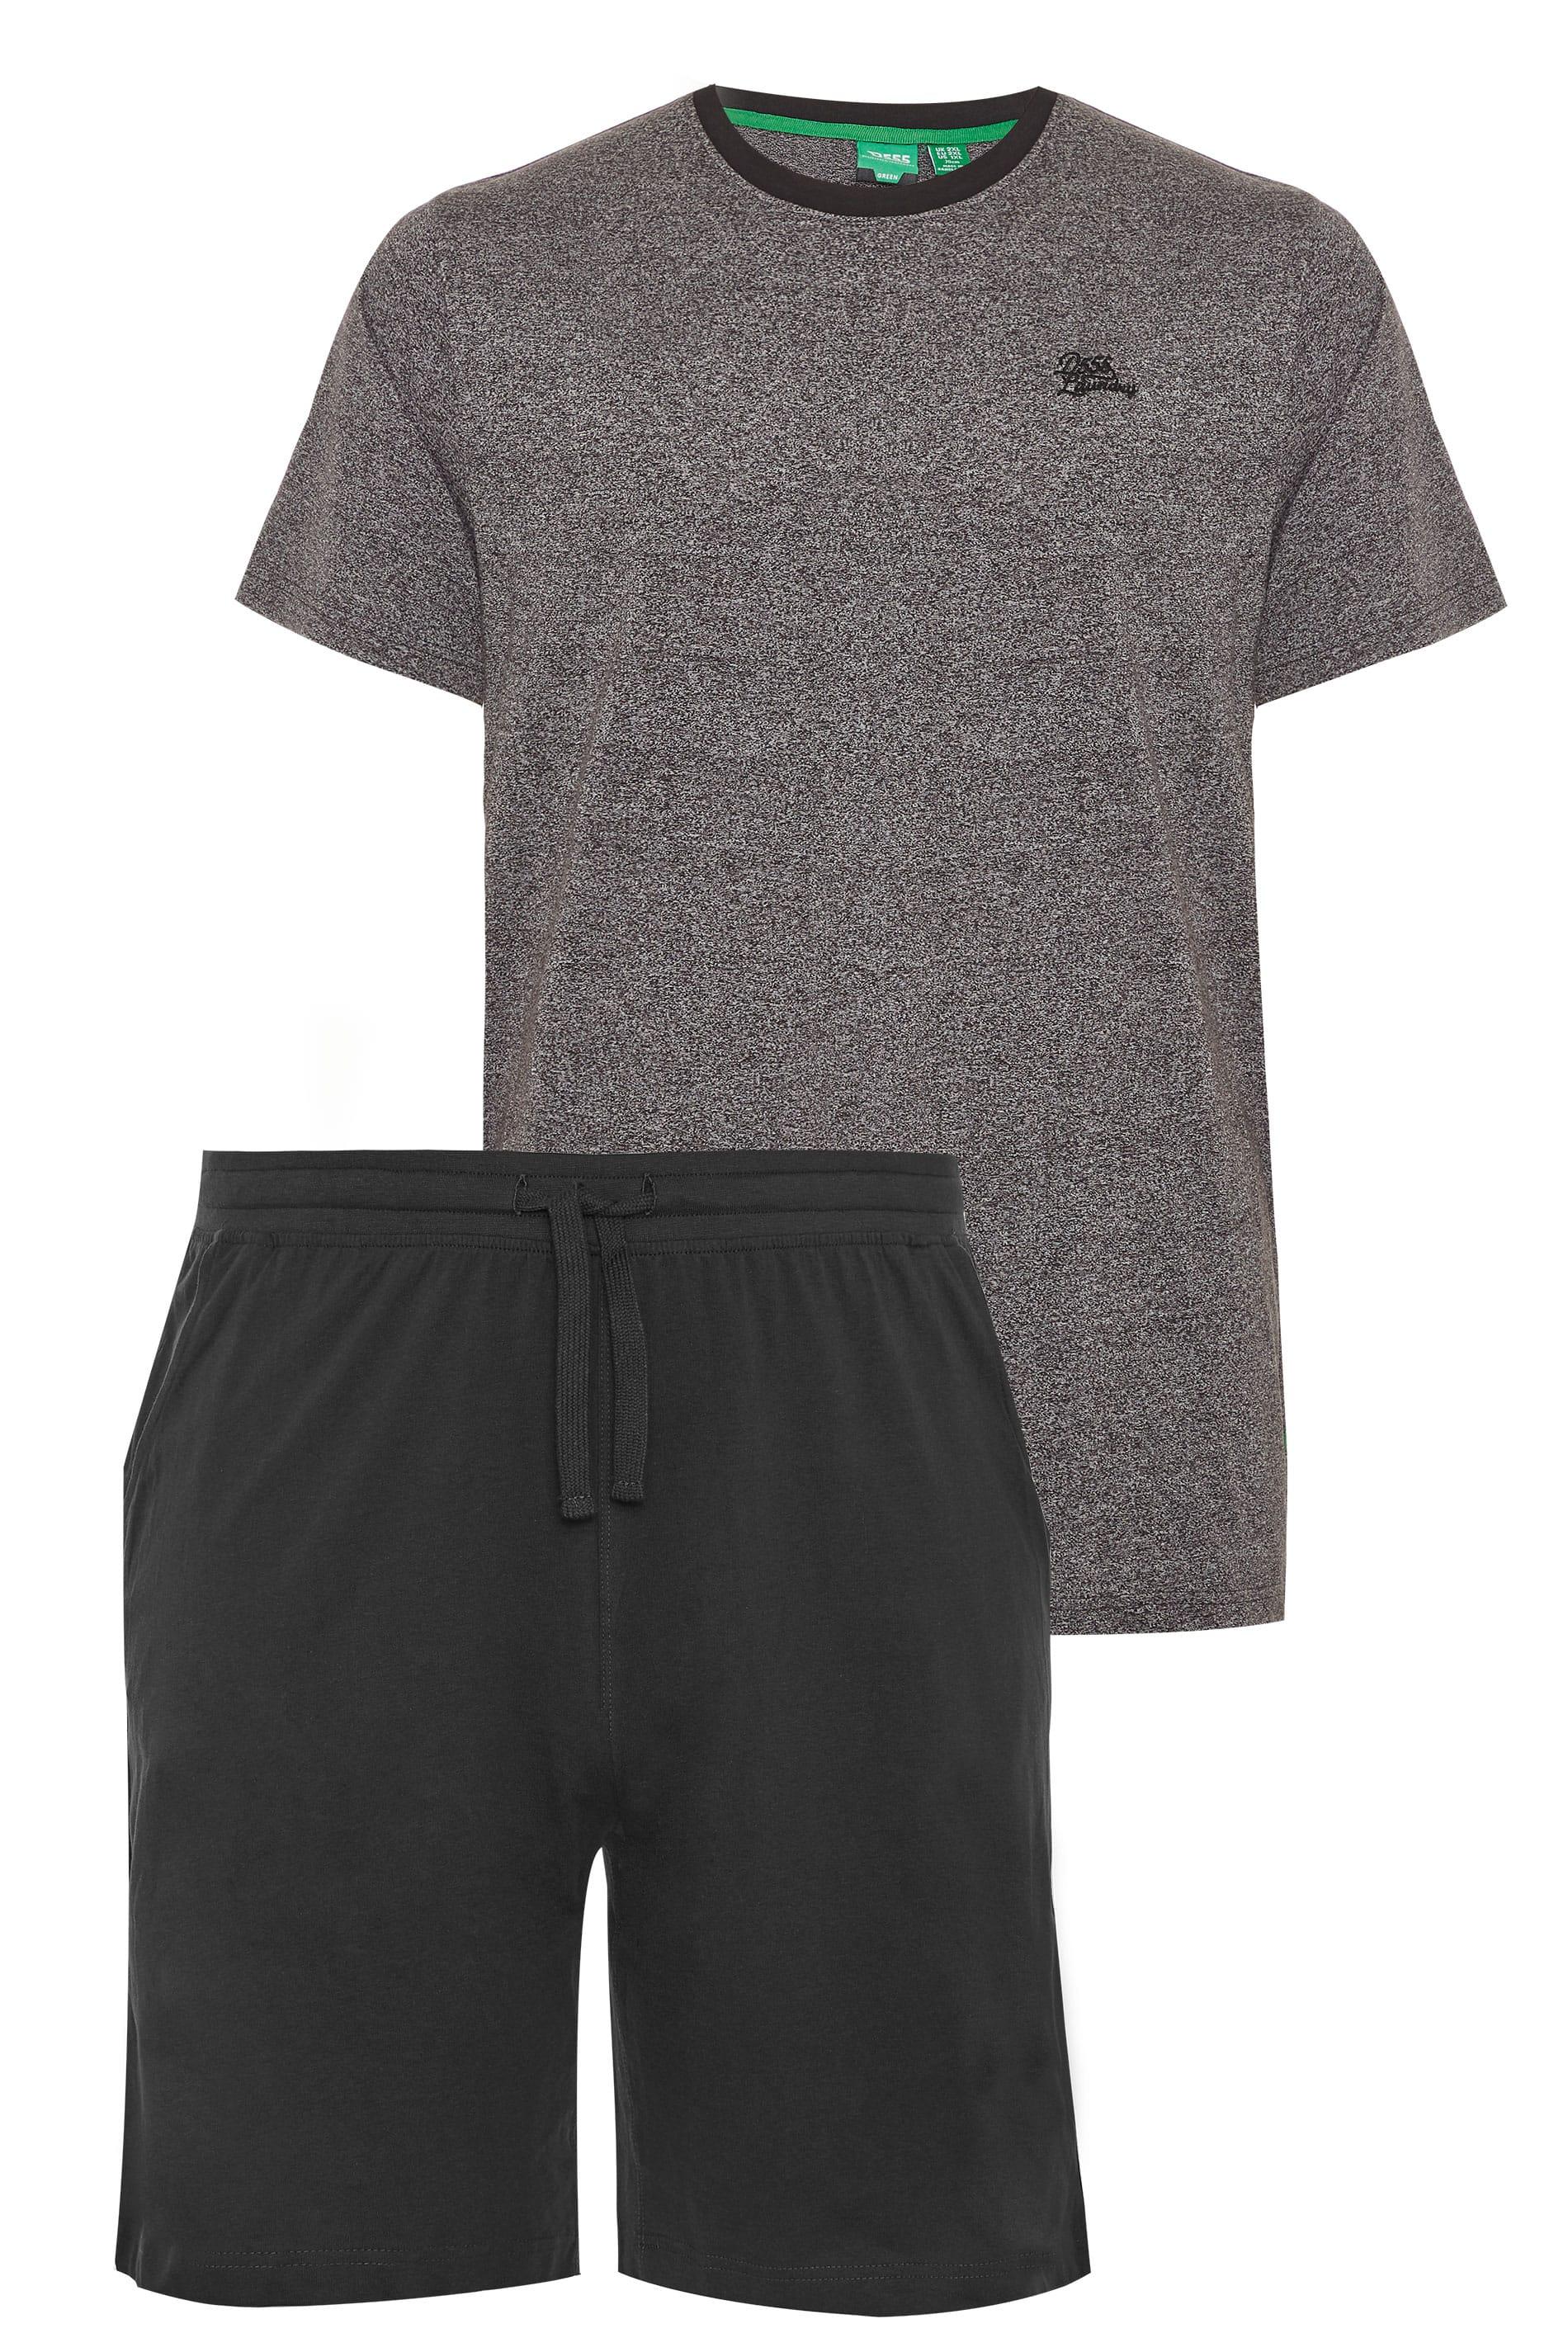 D555 Grey & Black T-Shirt & Shorts Loungewear Set